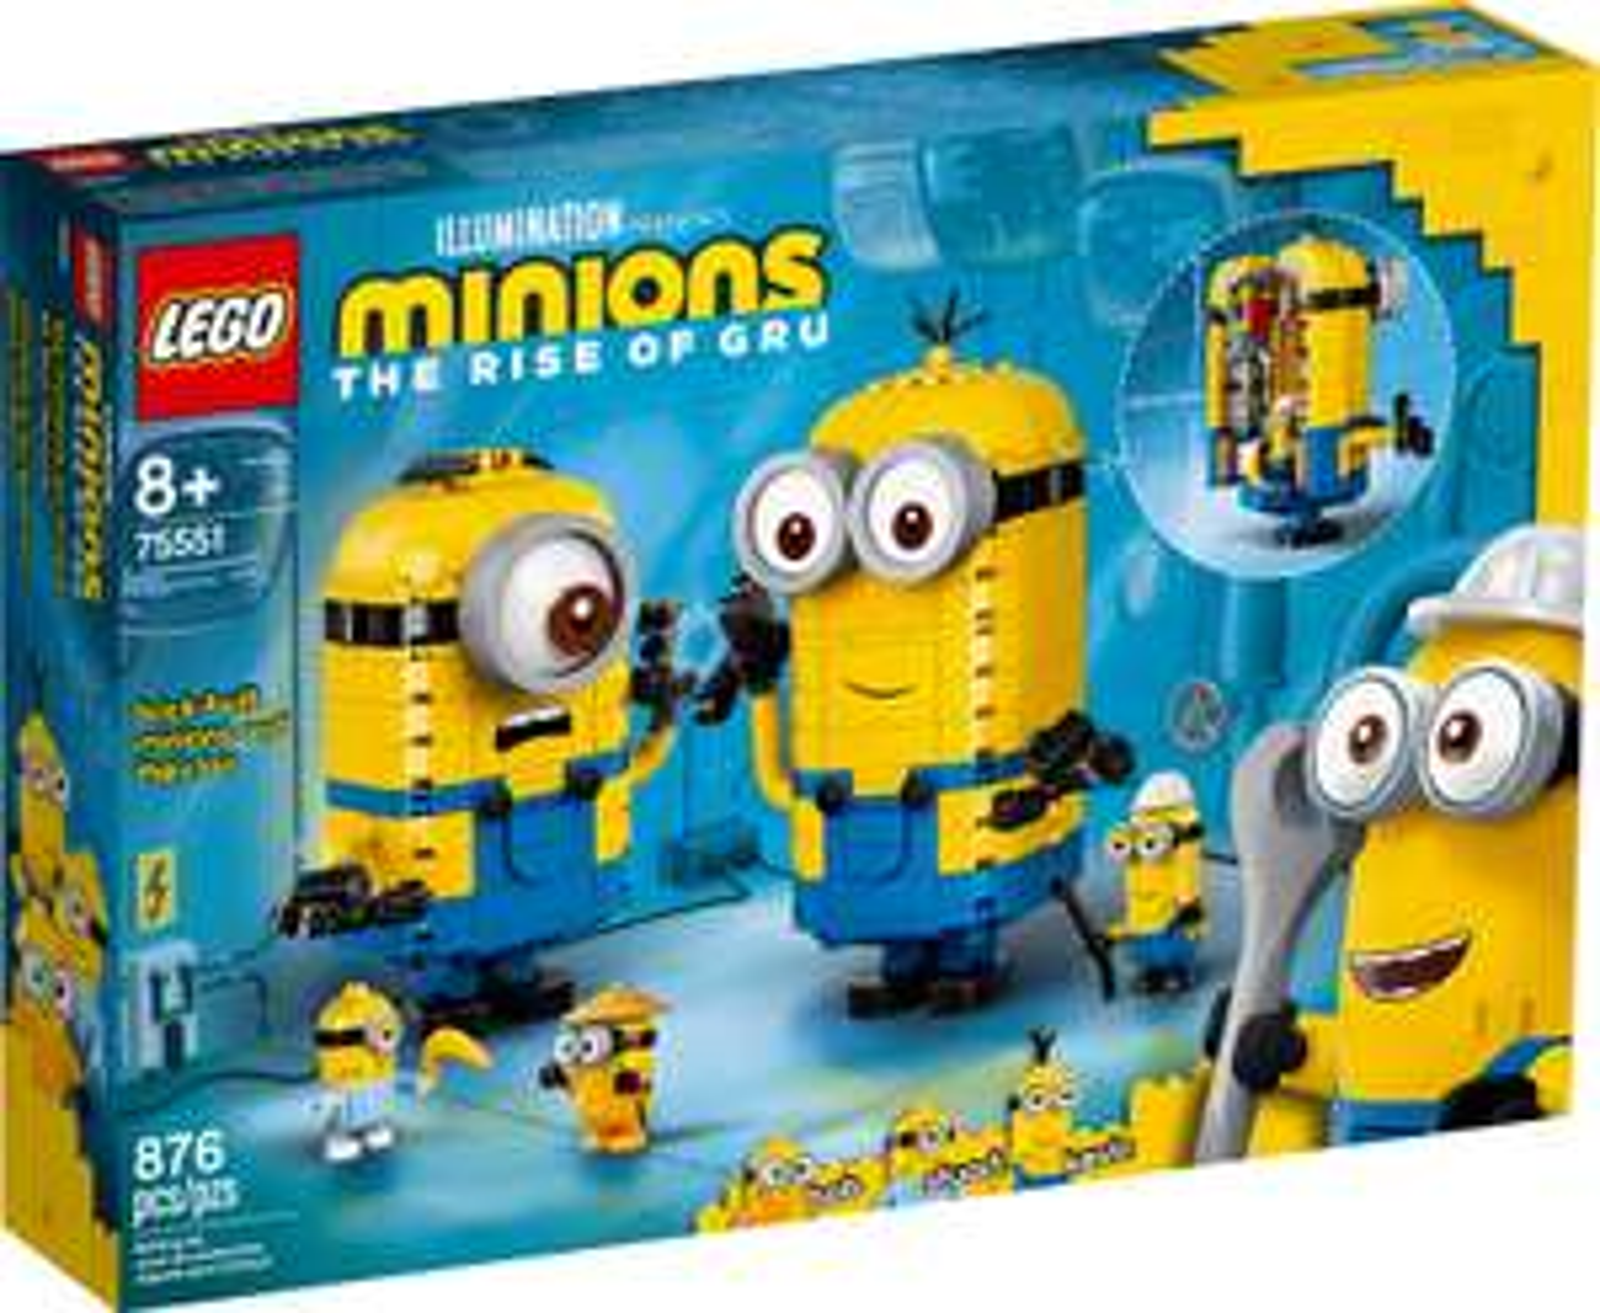 LEGO MINIONS 75551 Minionki i ich gniazdo